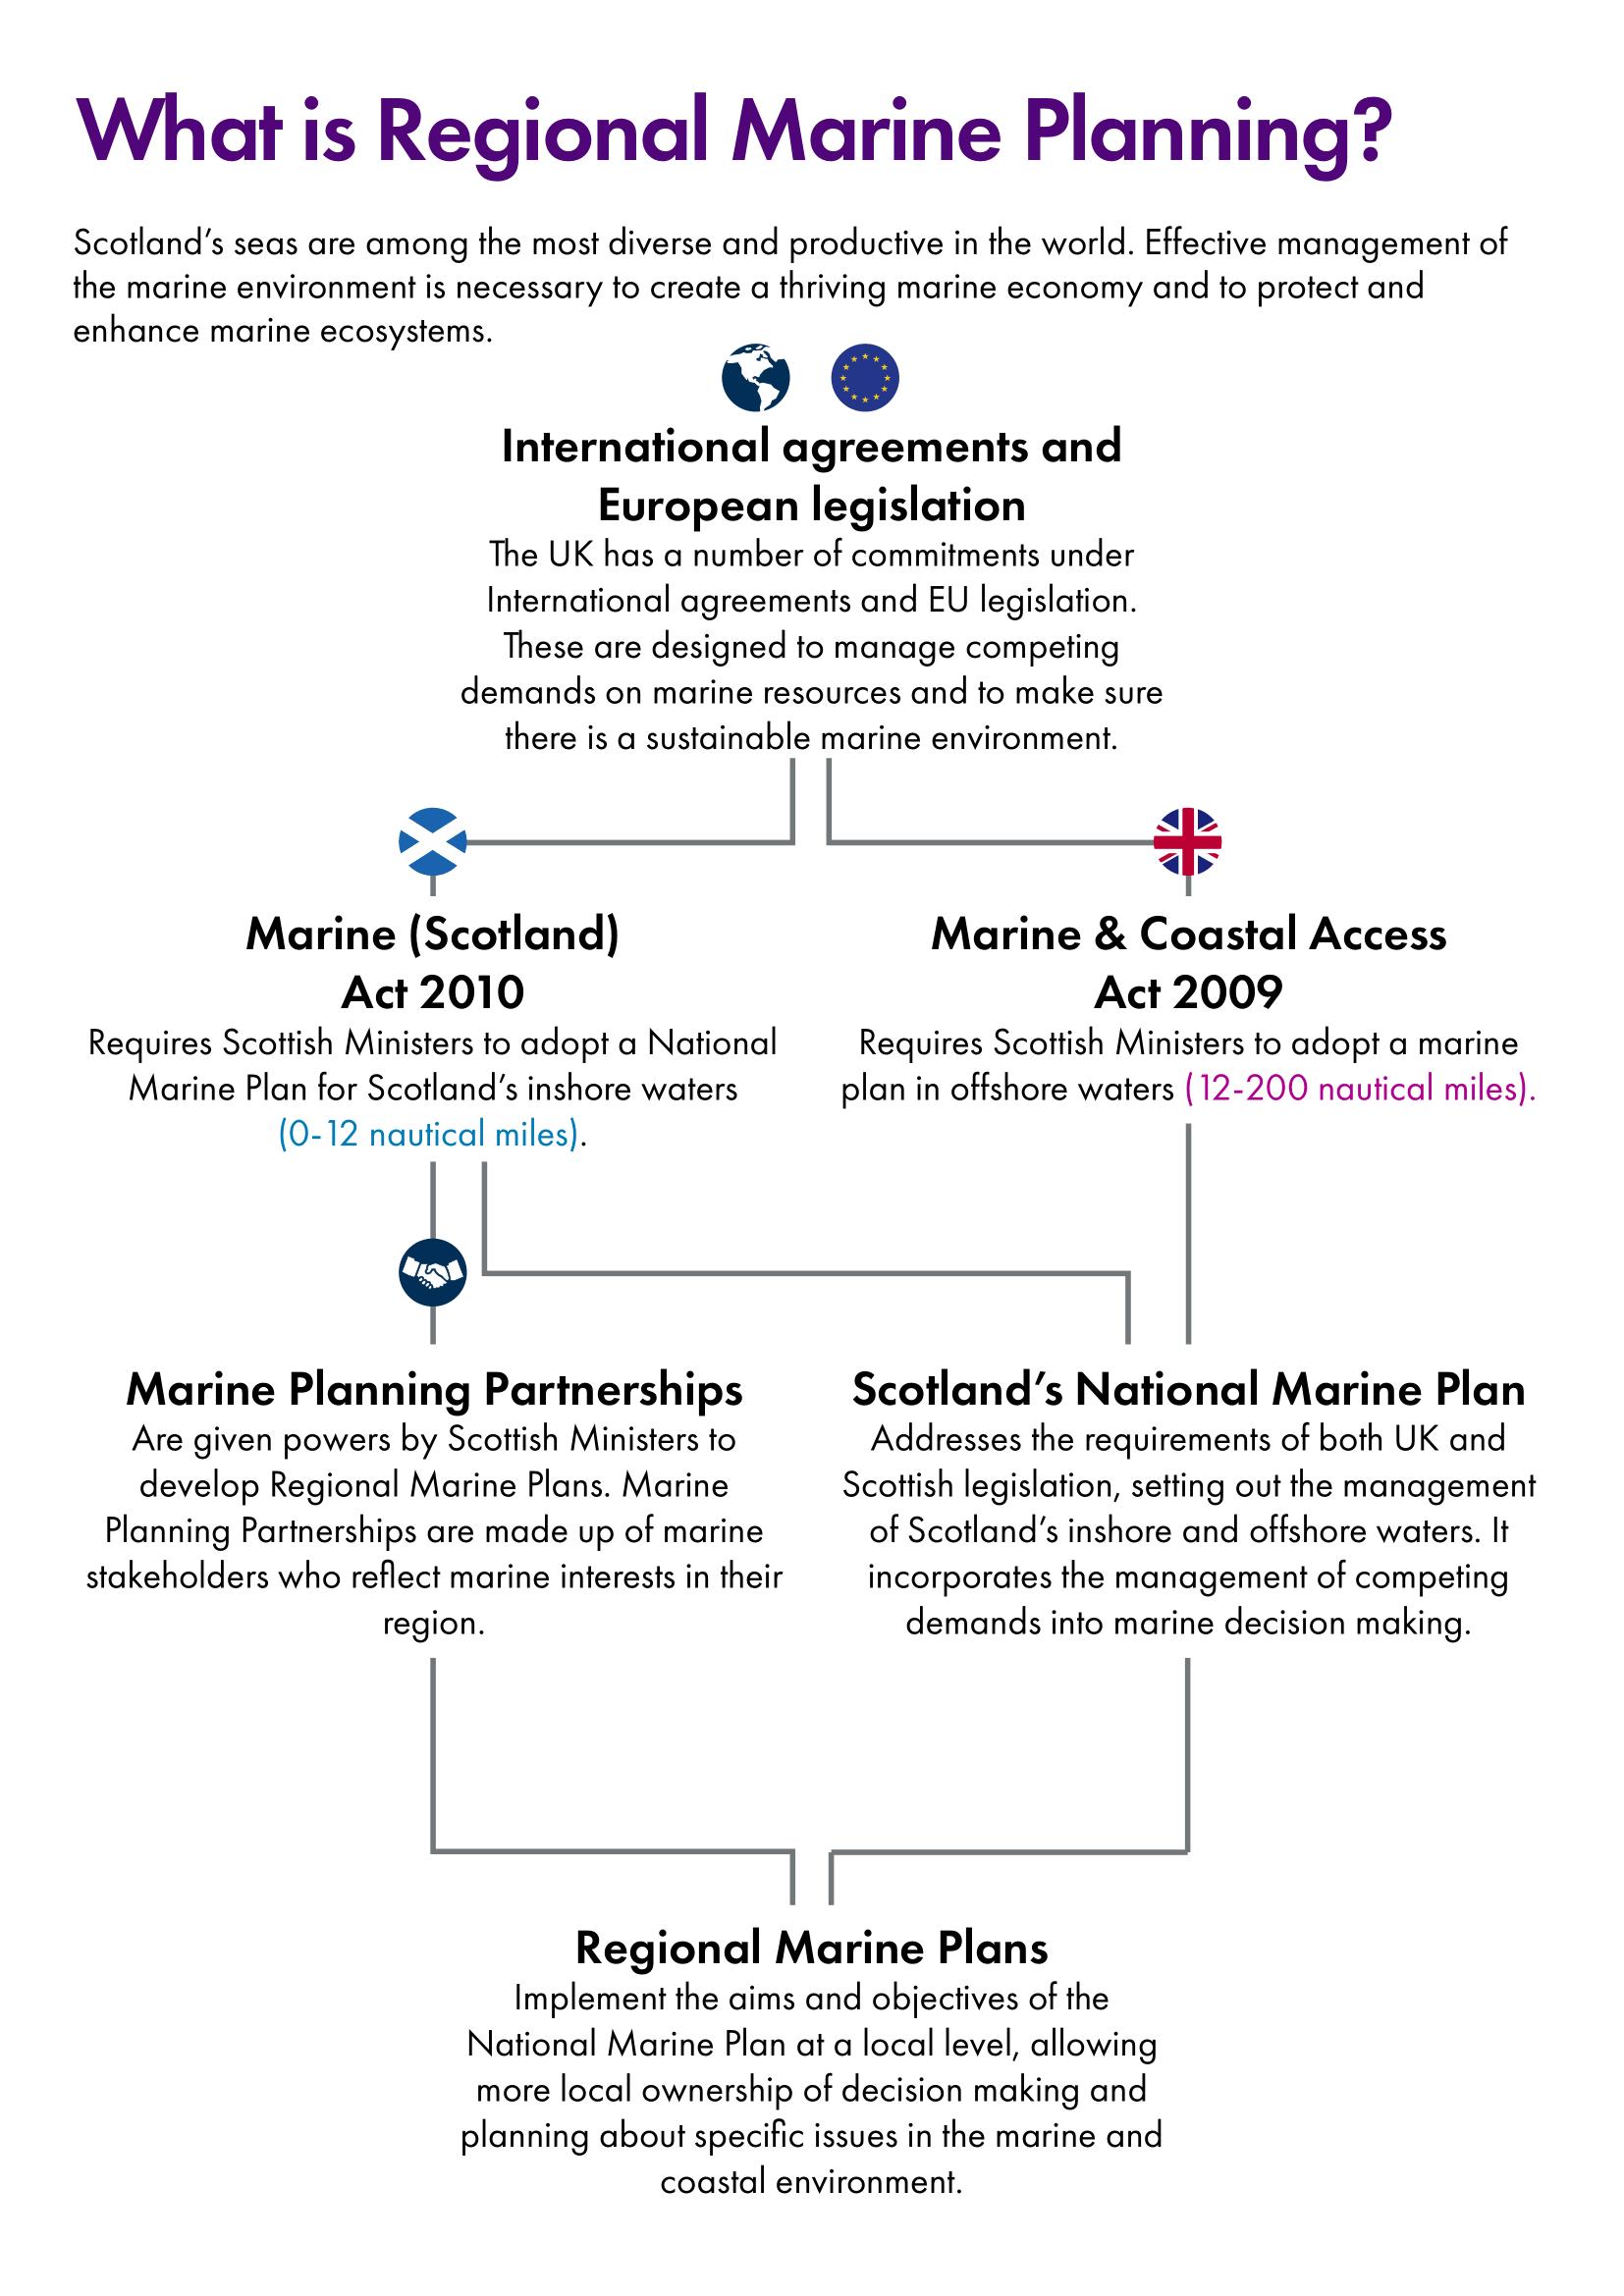 Flow chart showing the legislative framework for regional marine planning.